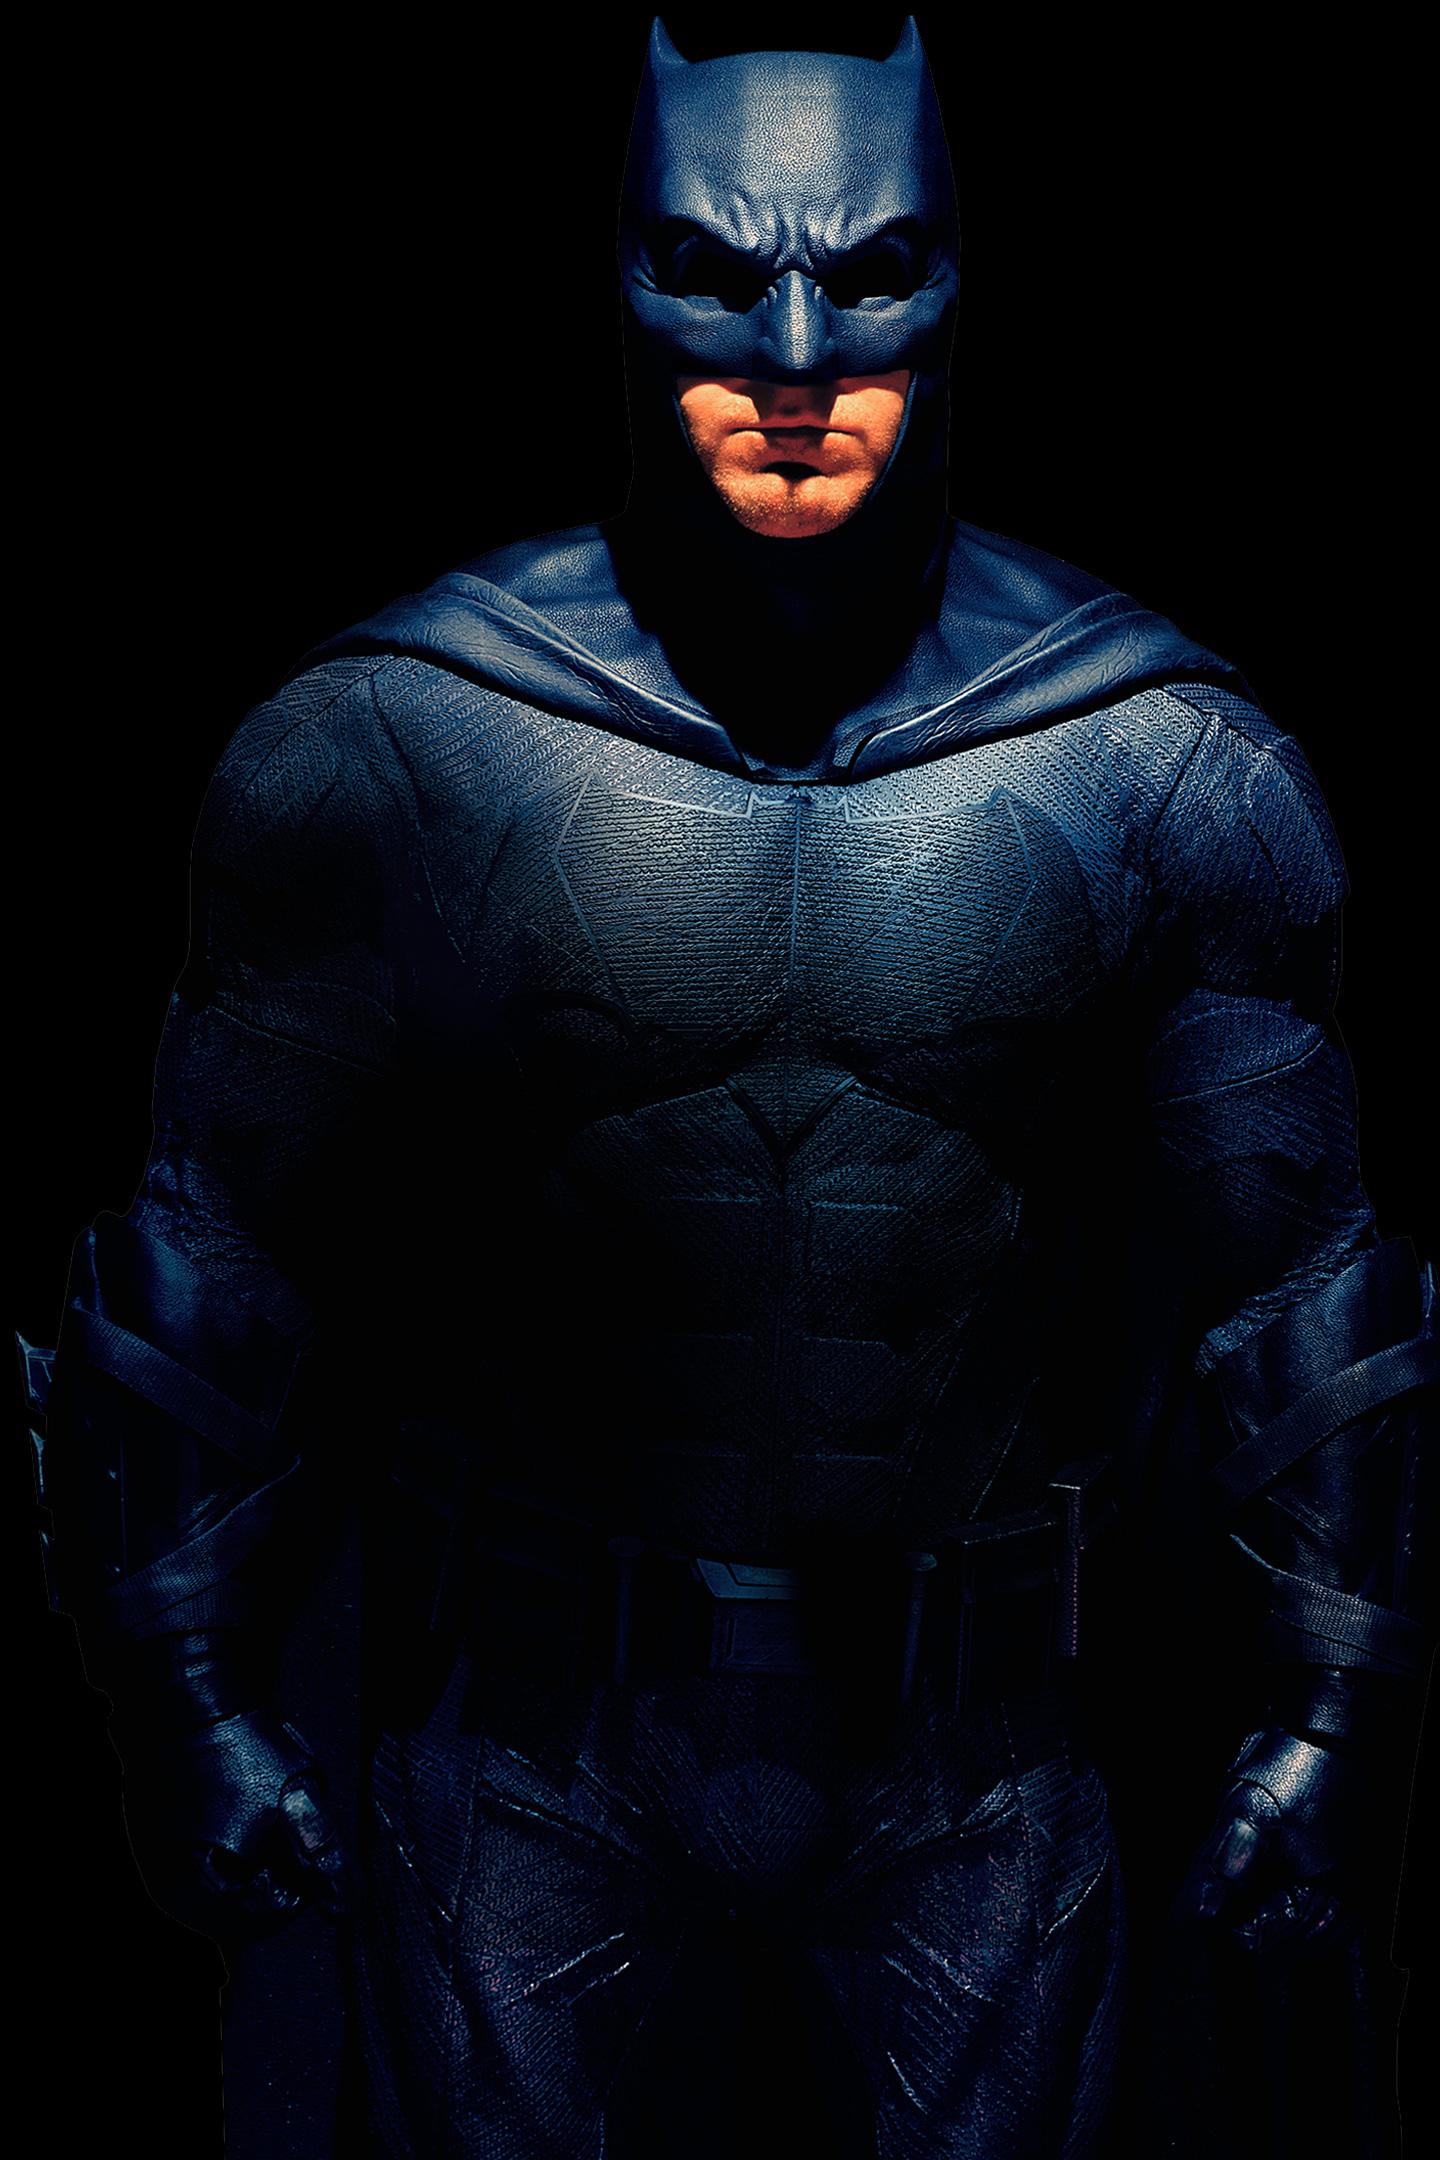 Download 1440x2630 Wallpaper Batman Superhero Justice League Movie 2017 Samsung Galaxy Note 8 1440x2630 Hd Image Background 151